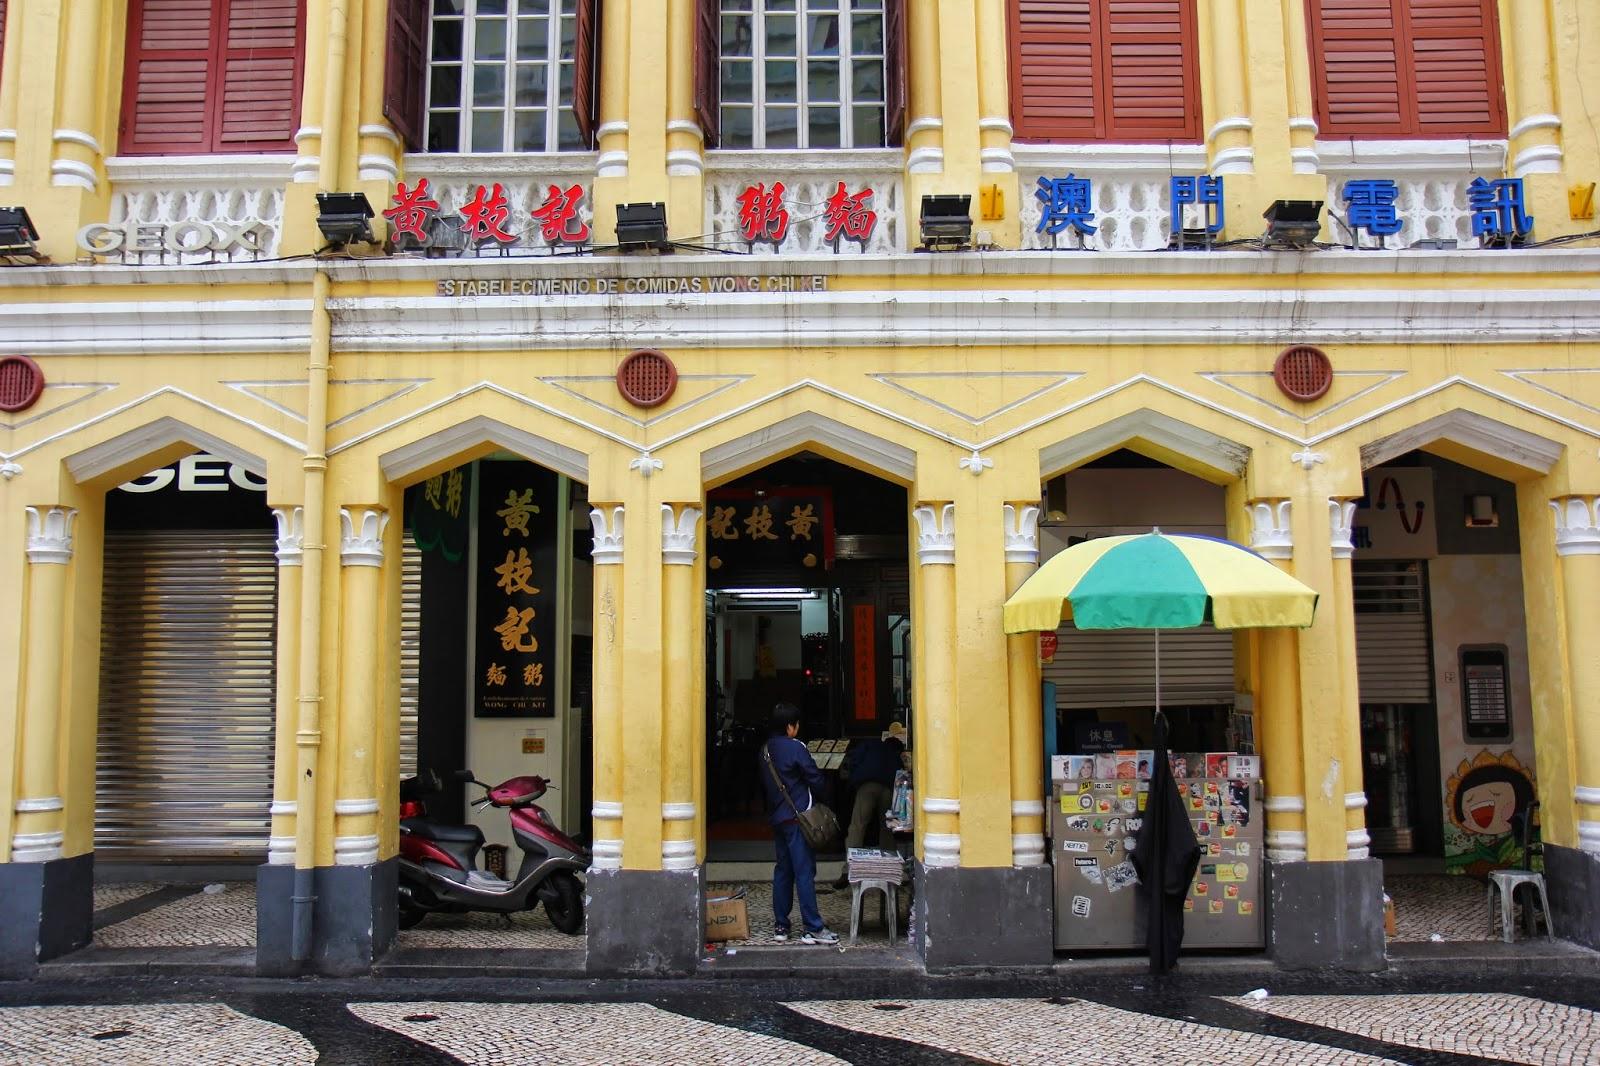 Where is FatBoy ?: Macau. Wong Chi Kei Congee & Noodle 黃枝記